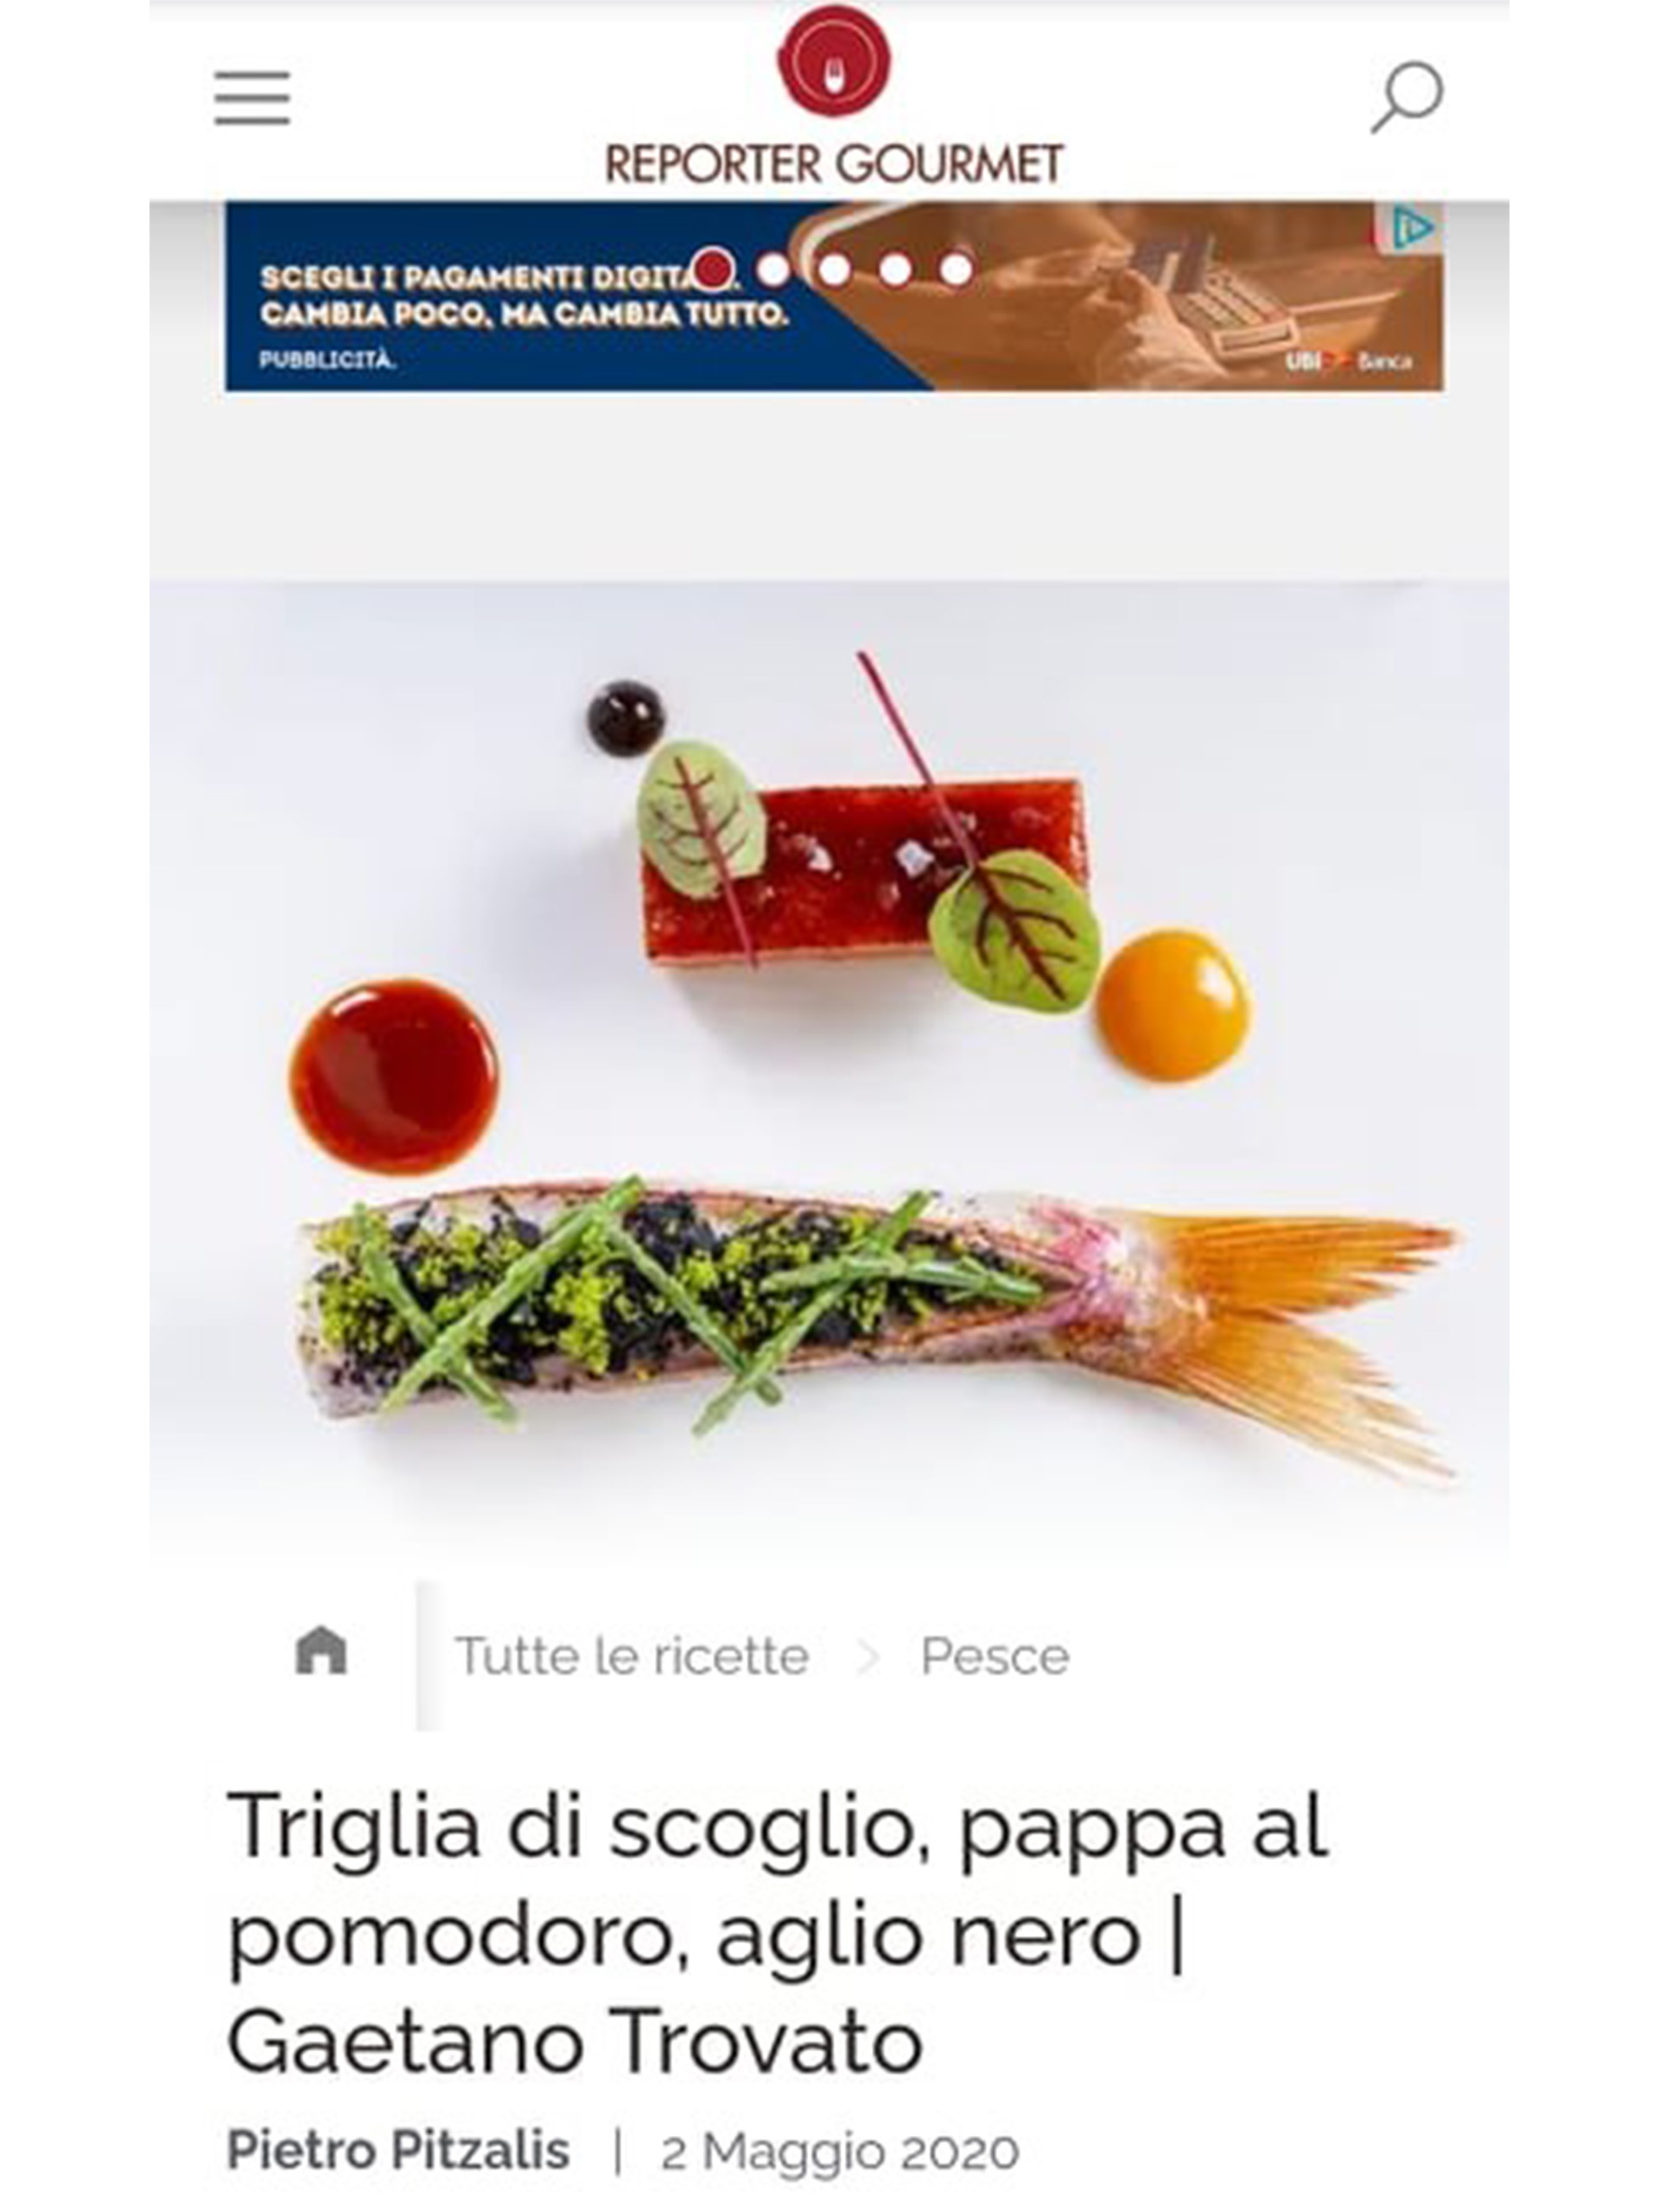 Arnolfo – Reporter Gourmet – Maggio 2020